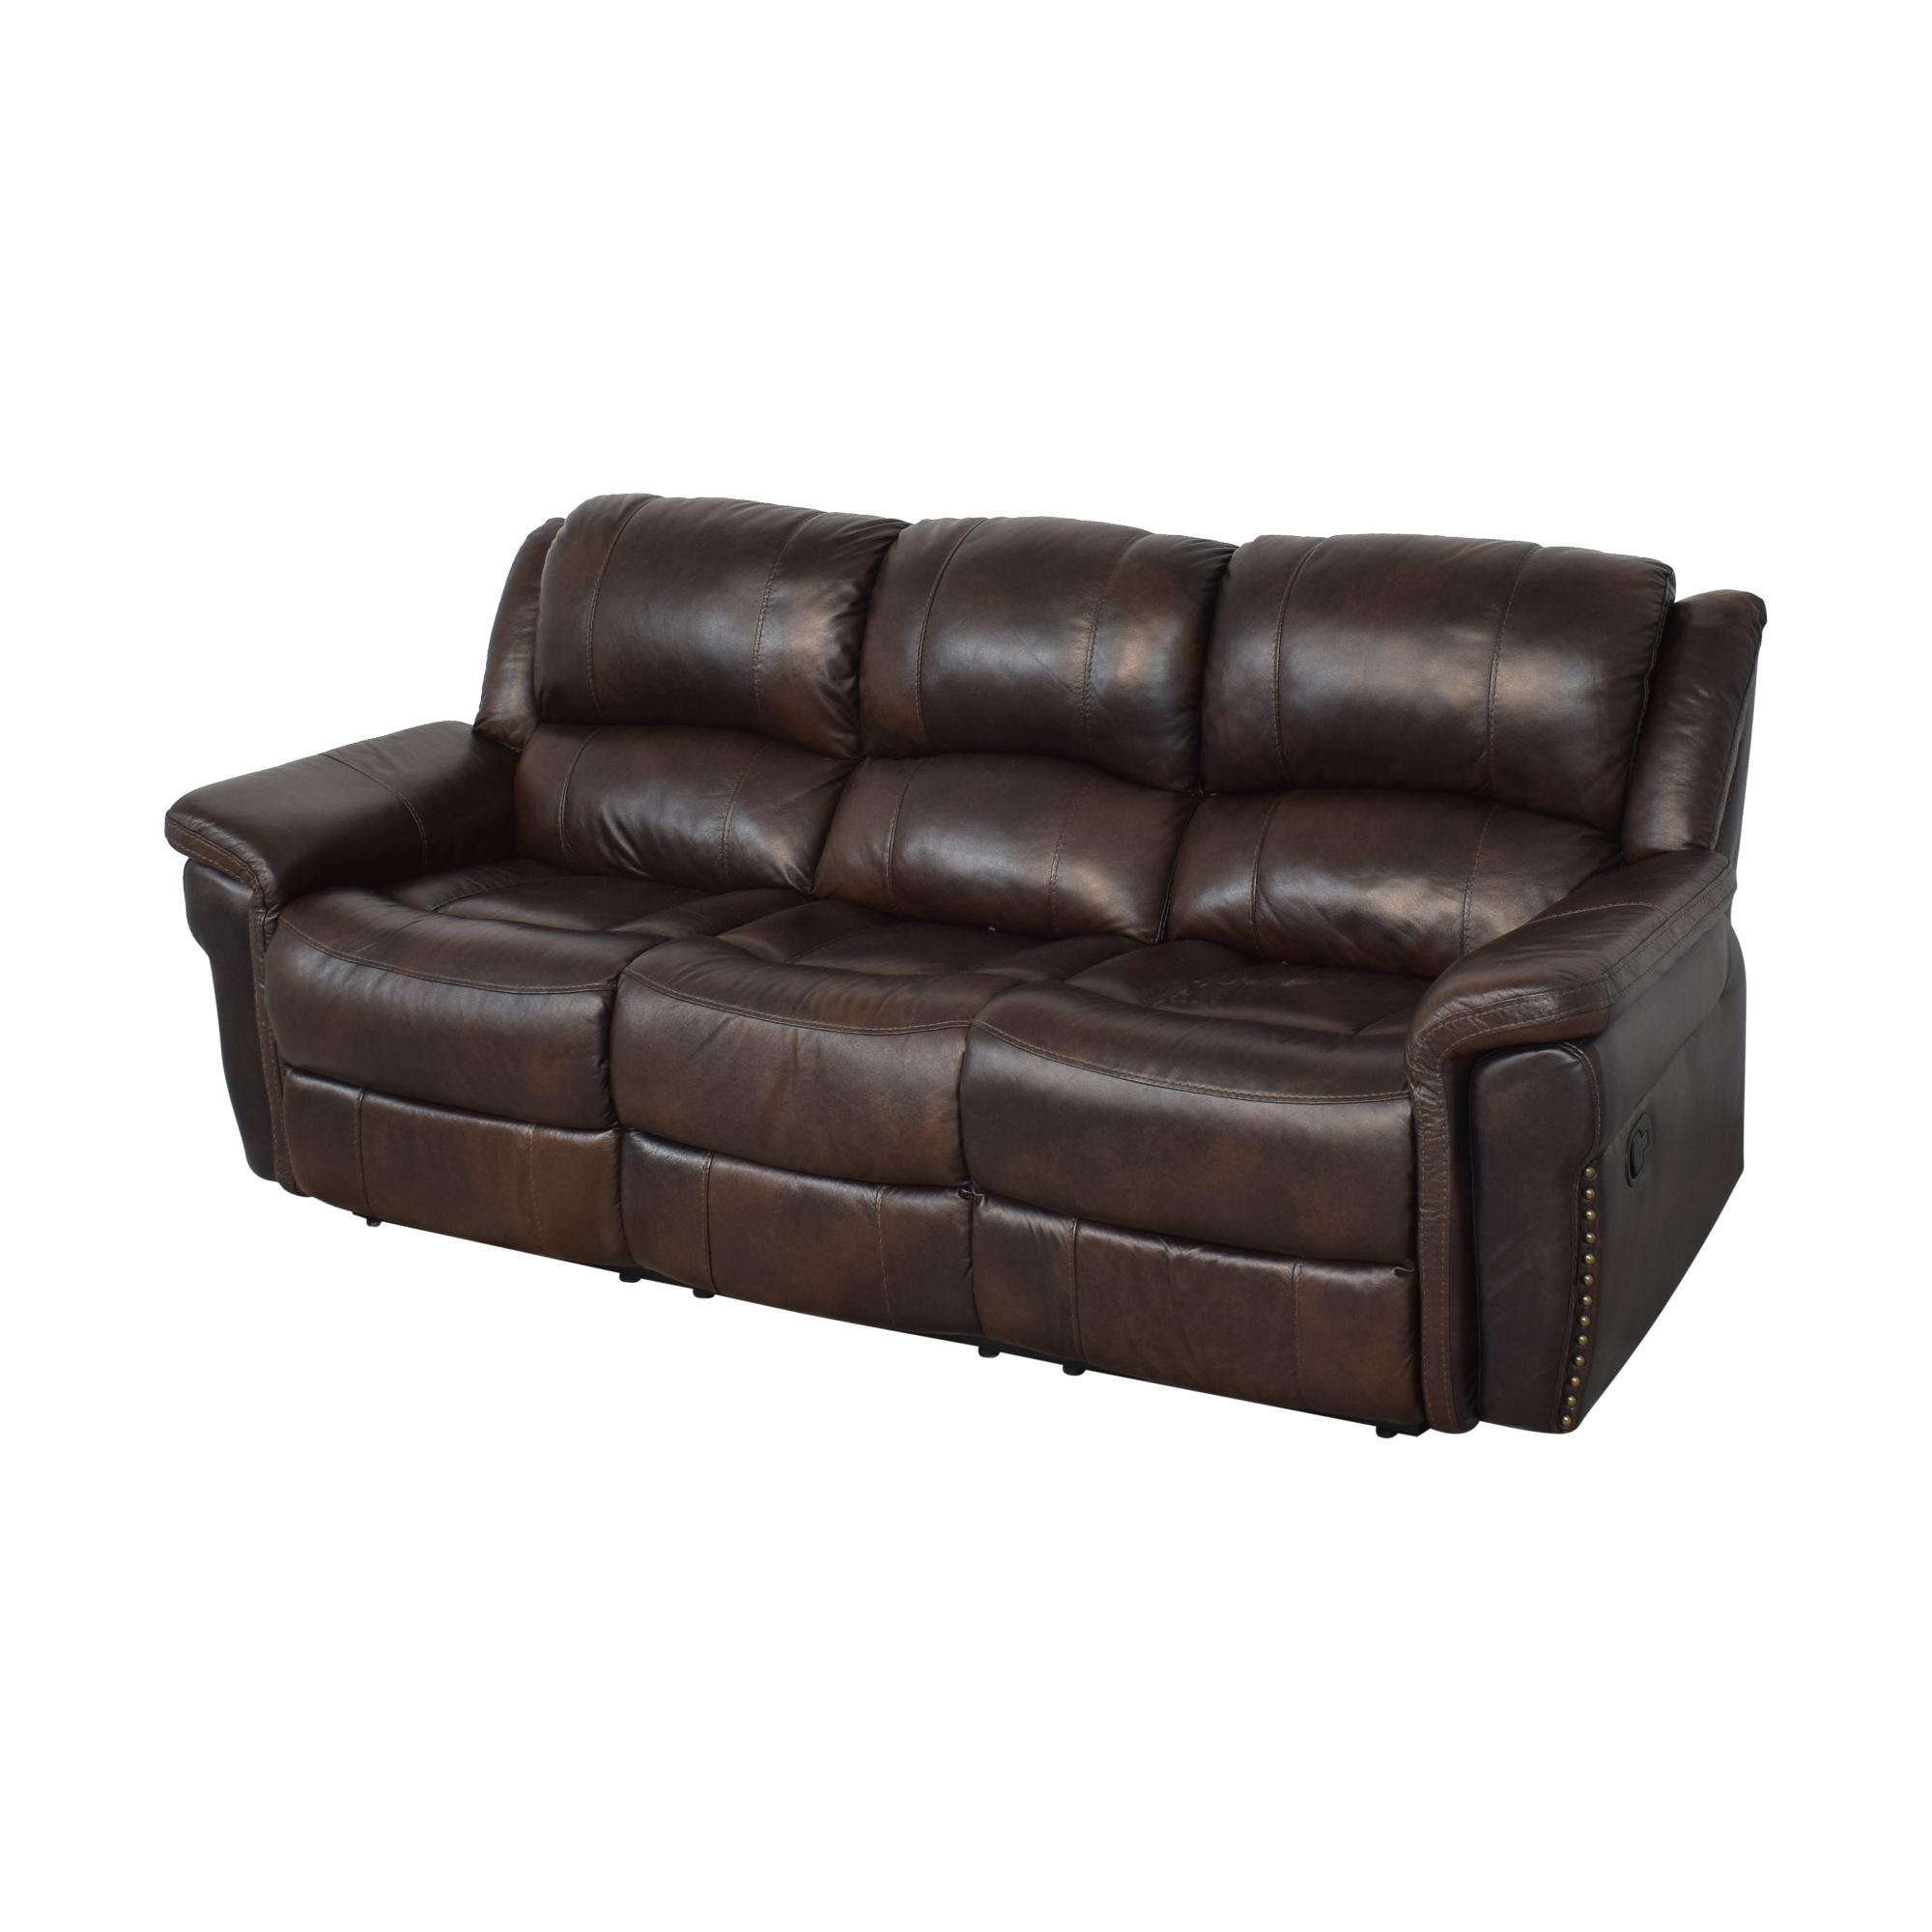 shop  Delancey Street Furniture Recliner Sofa online